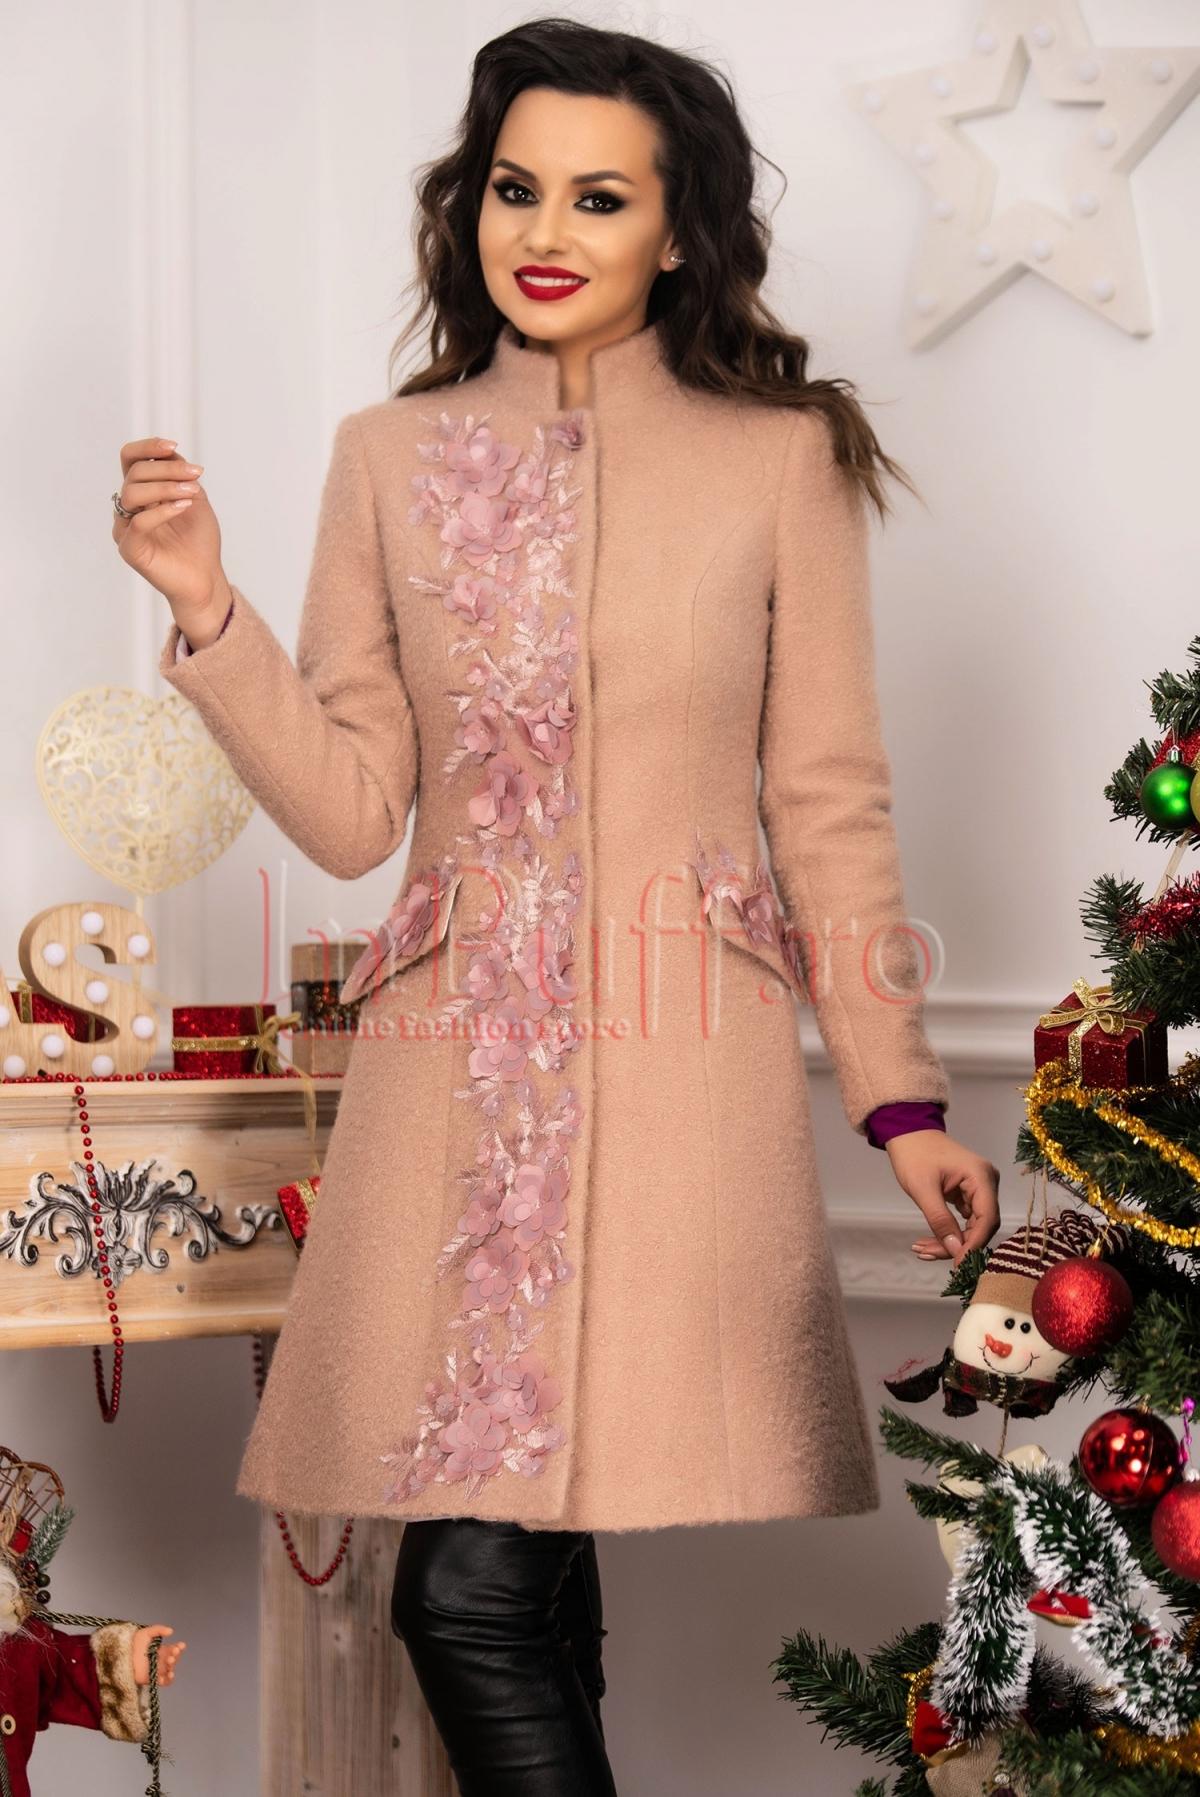 Palton elegant din lana roz-pudra cu flori 3D aplicate